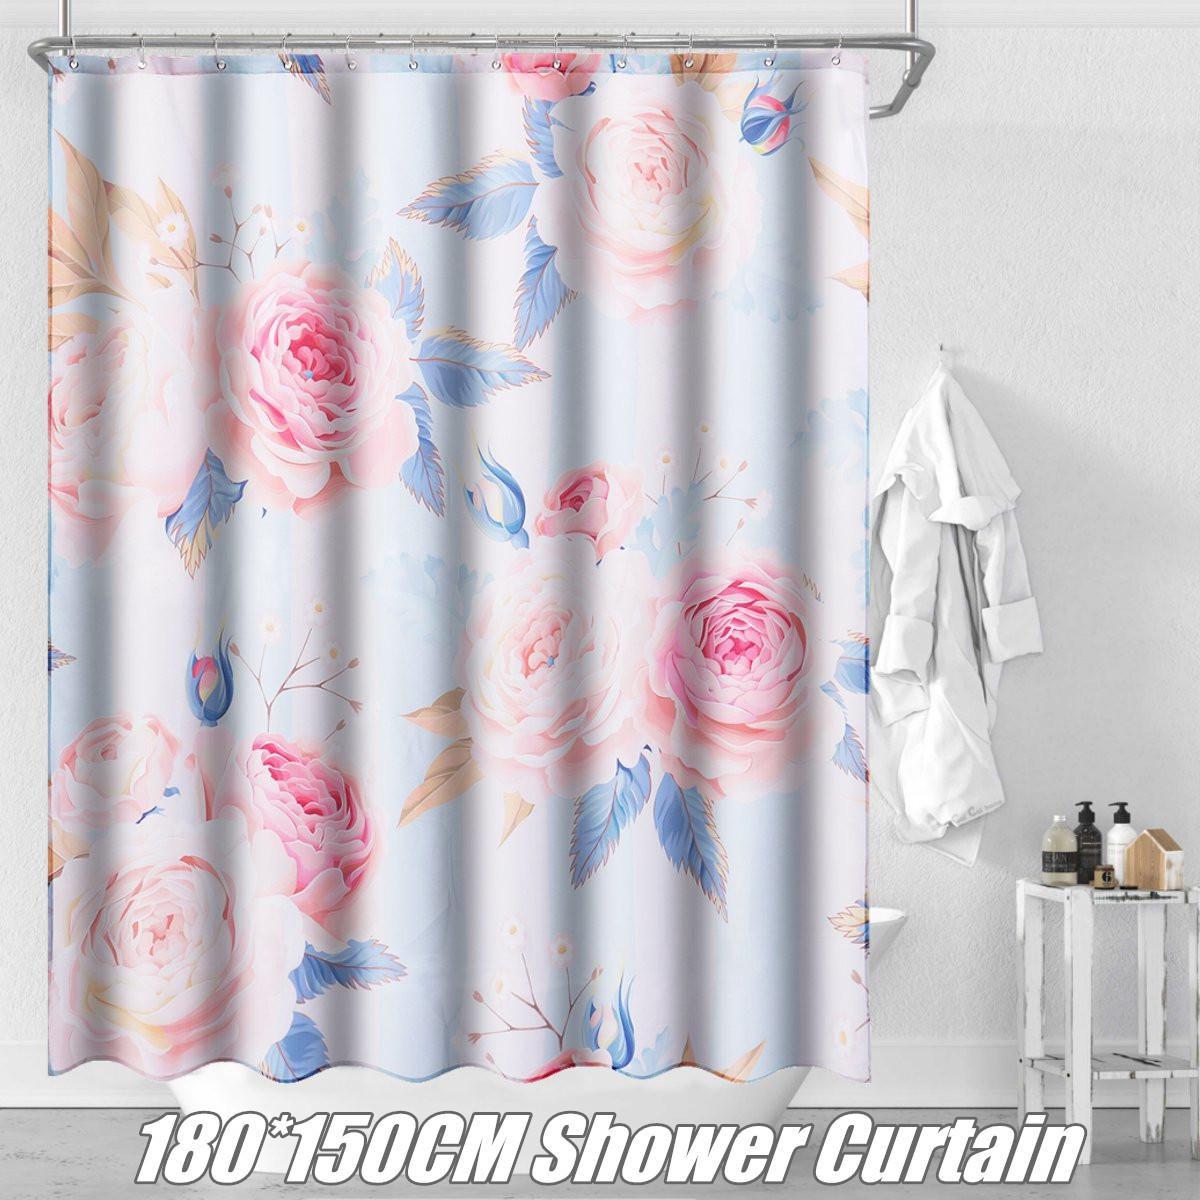 Buy 1 8x1 5m Waterproof Fabric Shower Curtain Bathroom